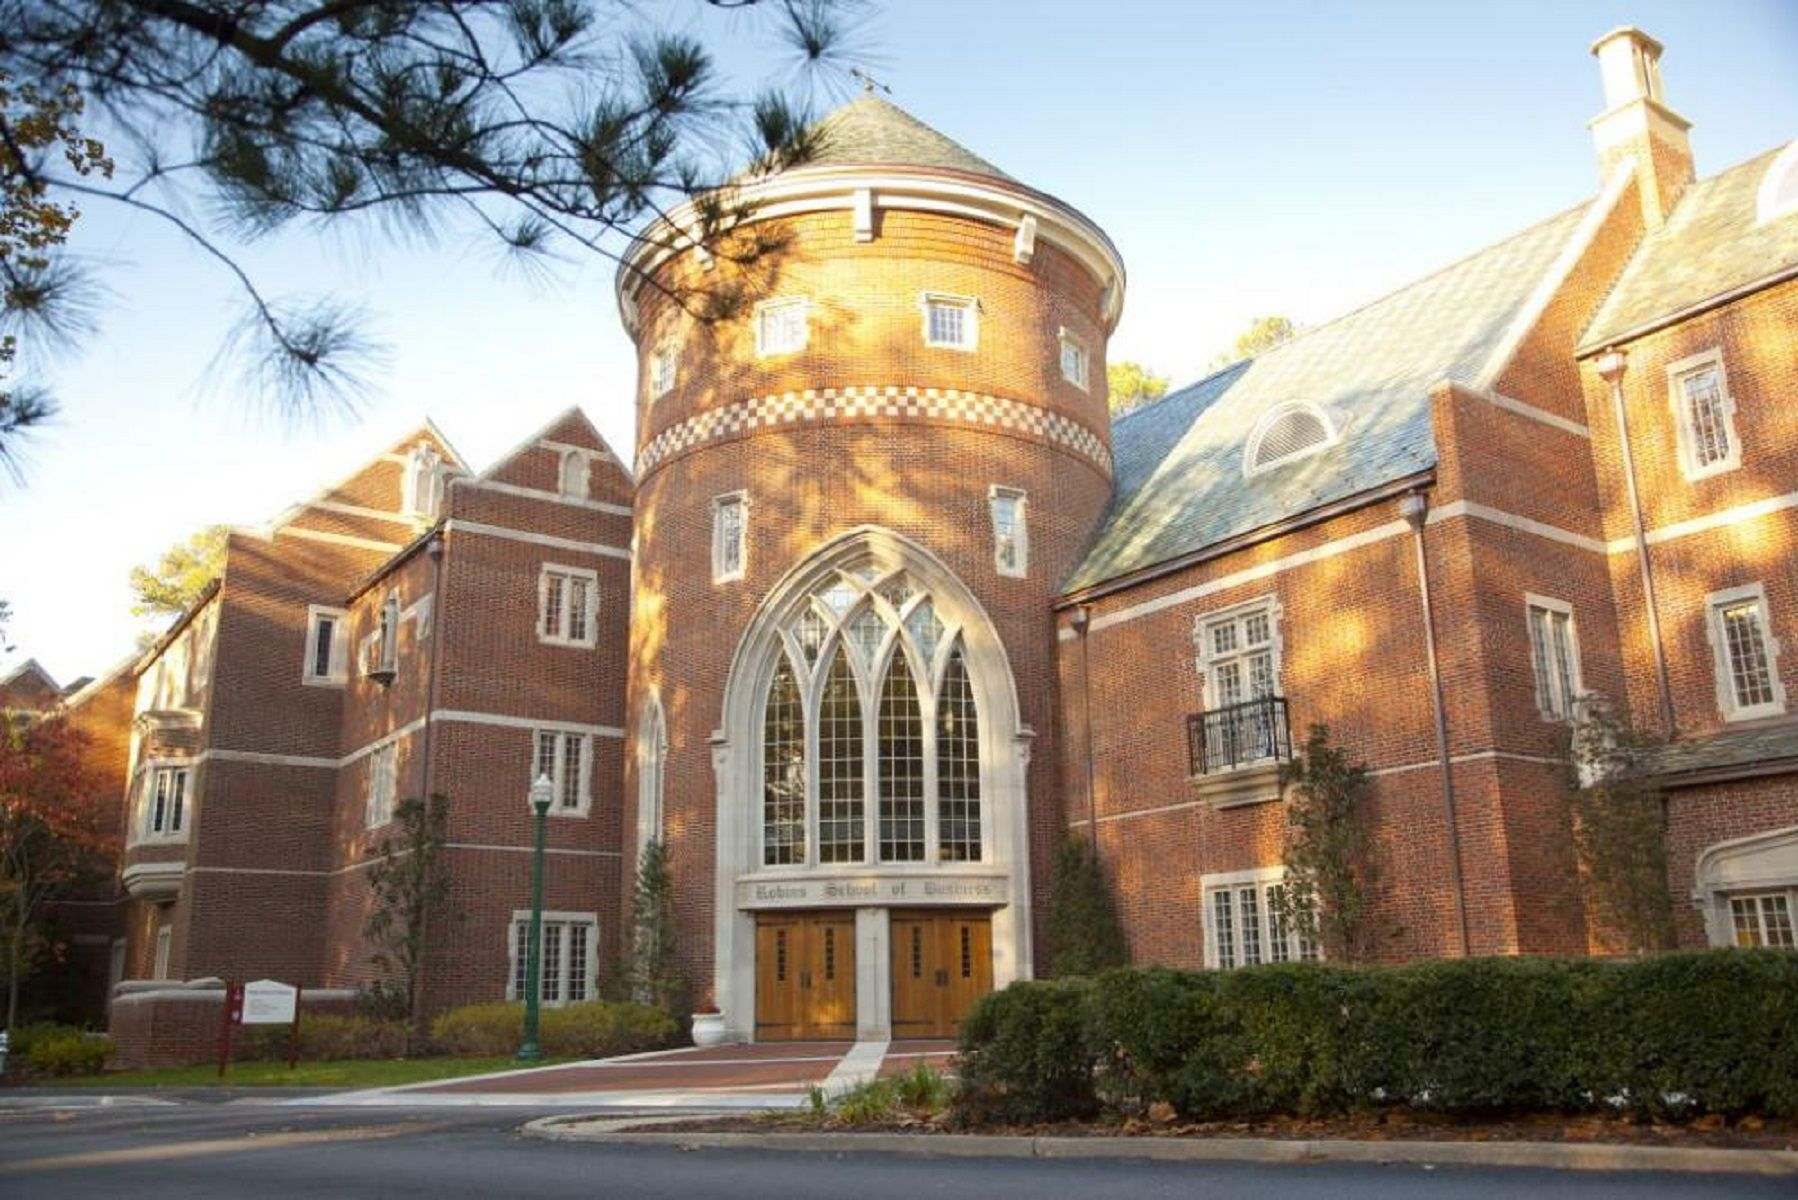 E. Claiborne Robins School of Business